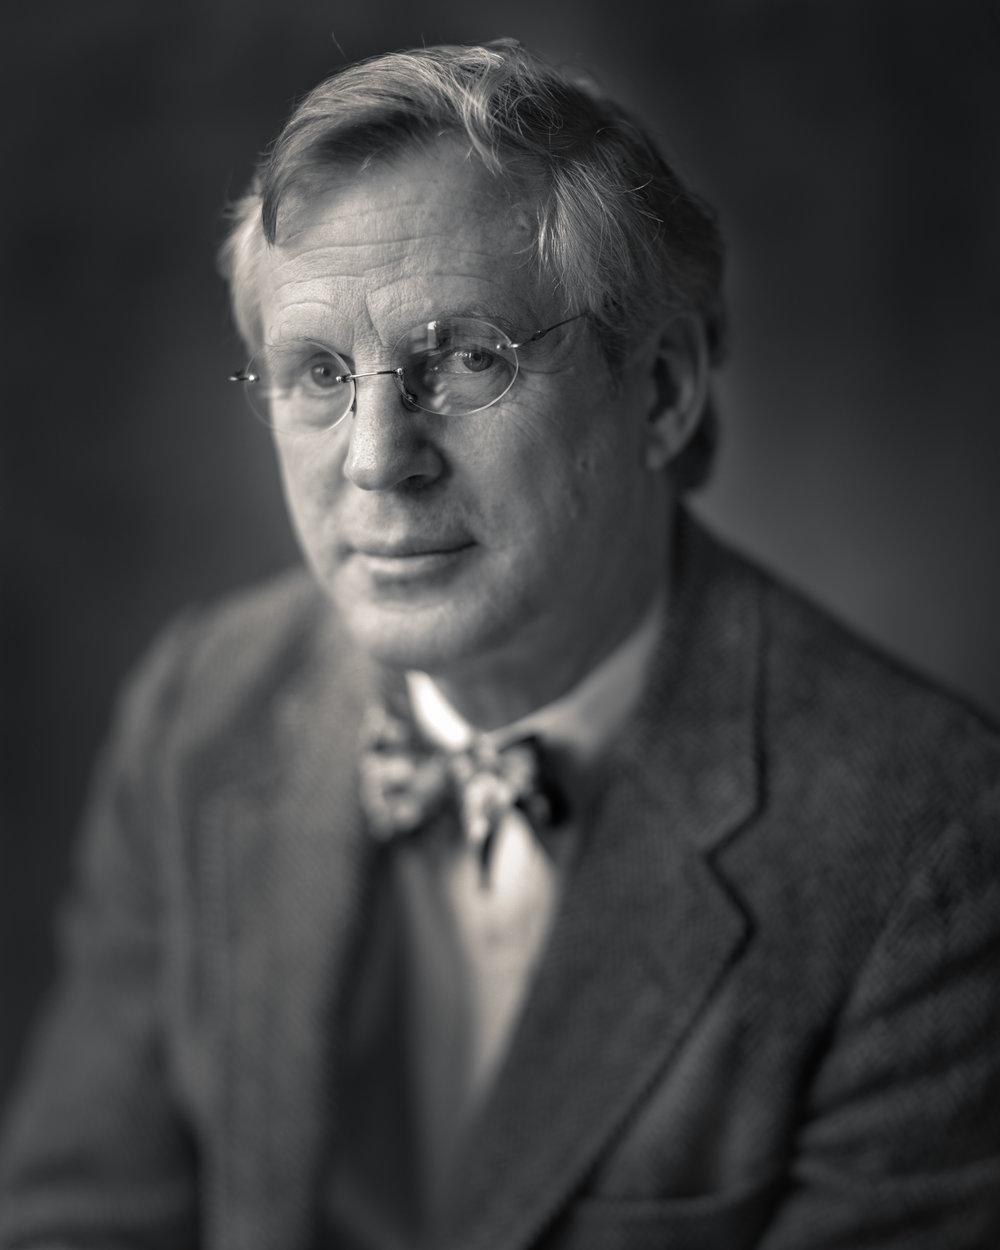 Dr. John Watkins